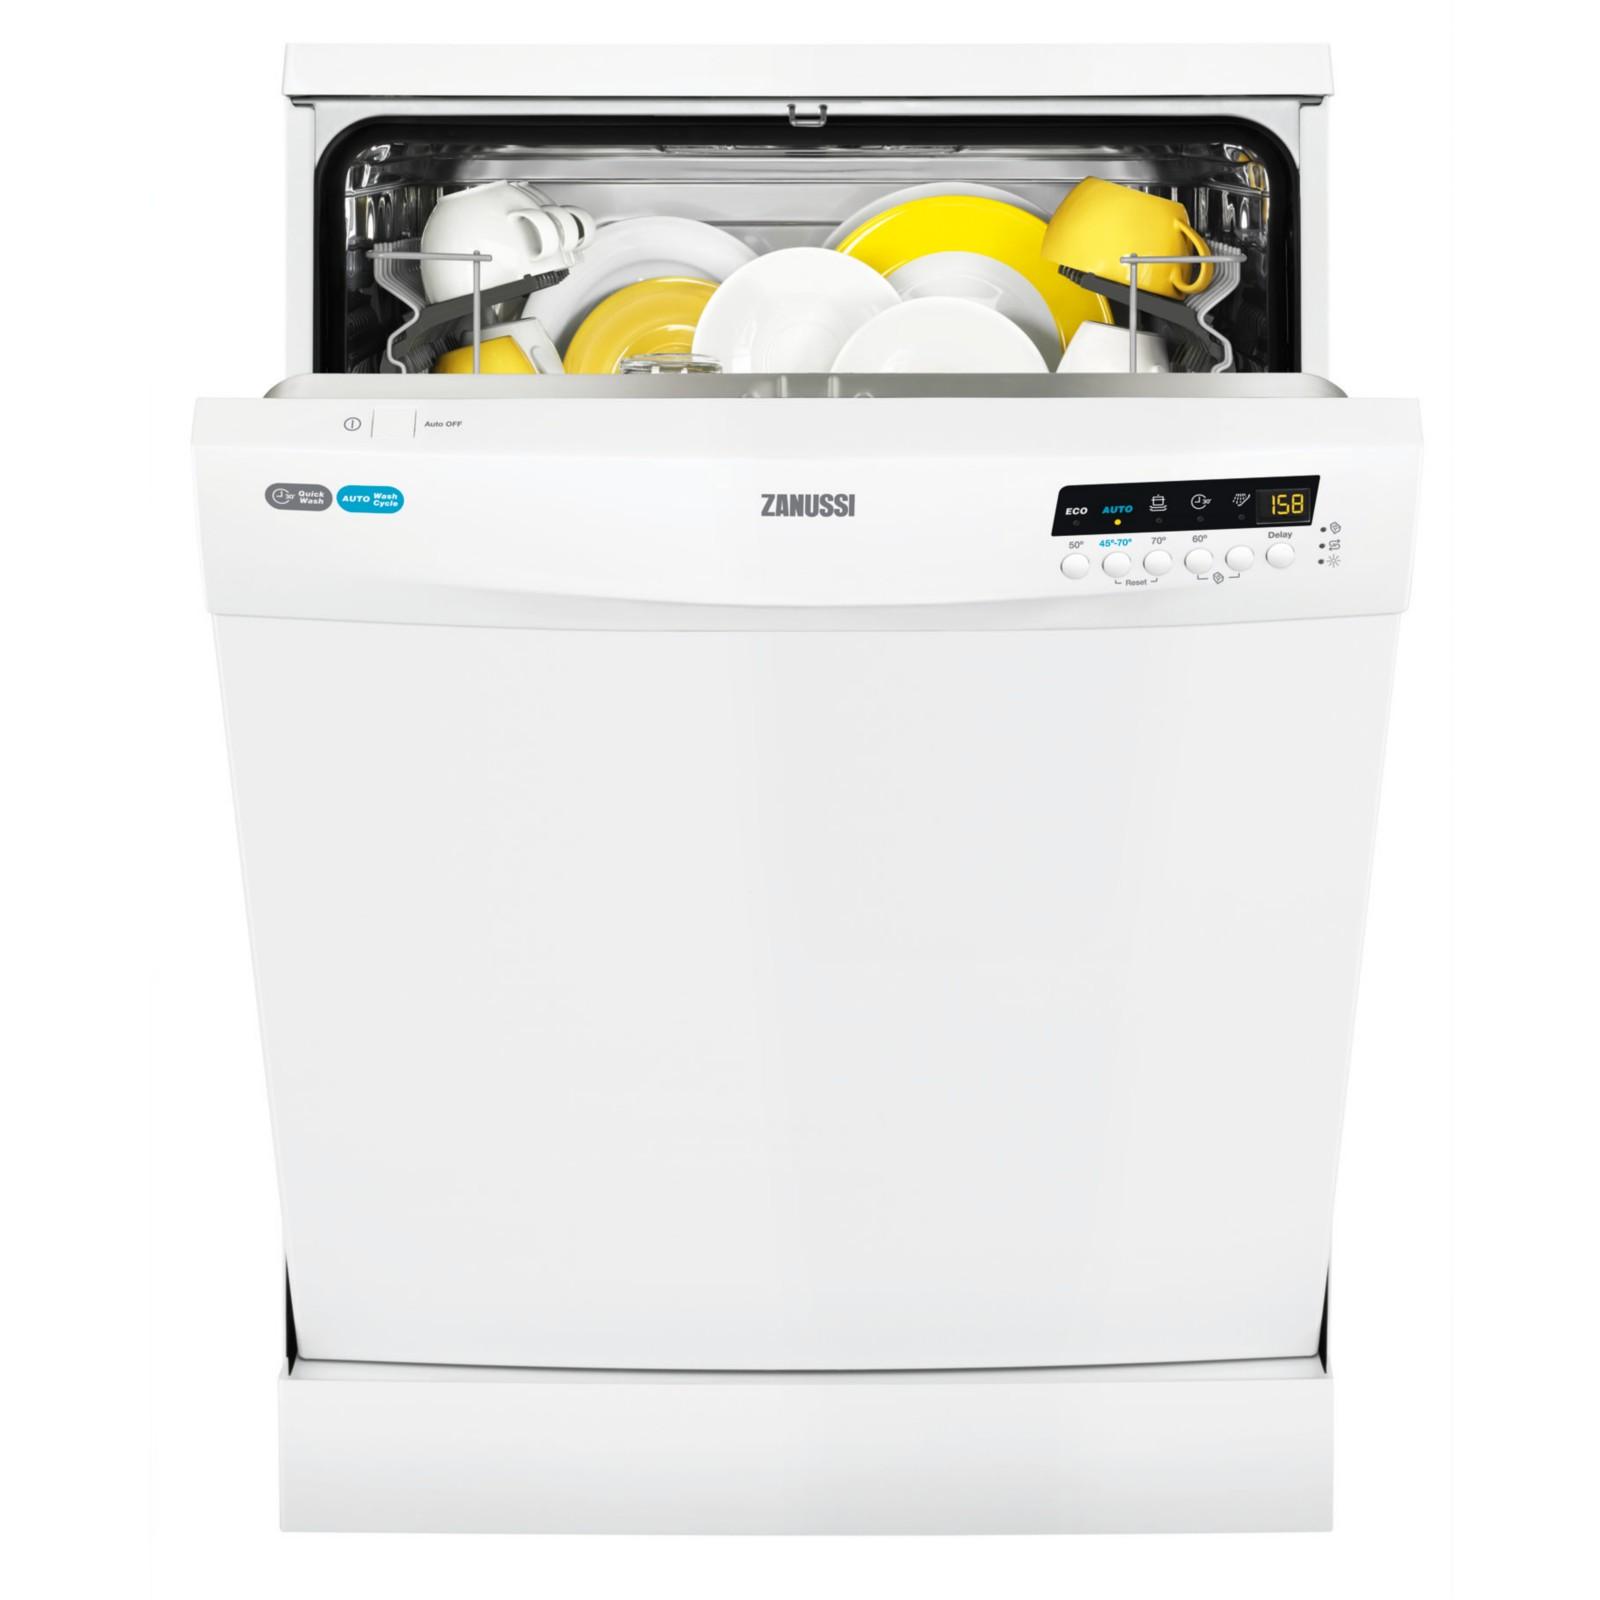 Zanussi ZDF26001WA Freestanding Dishwasher